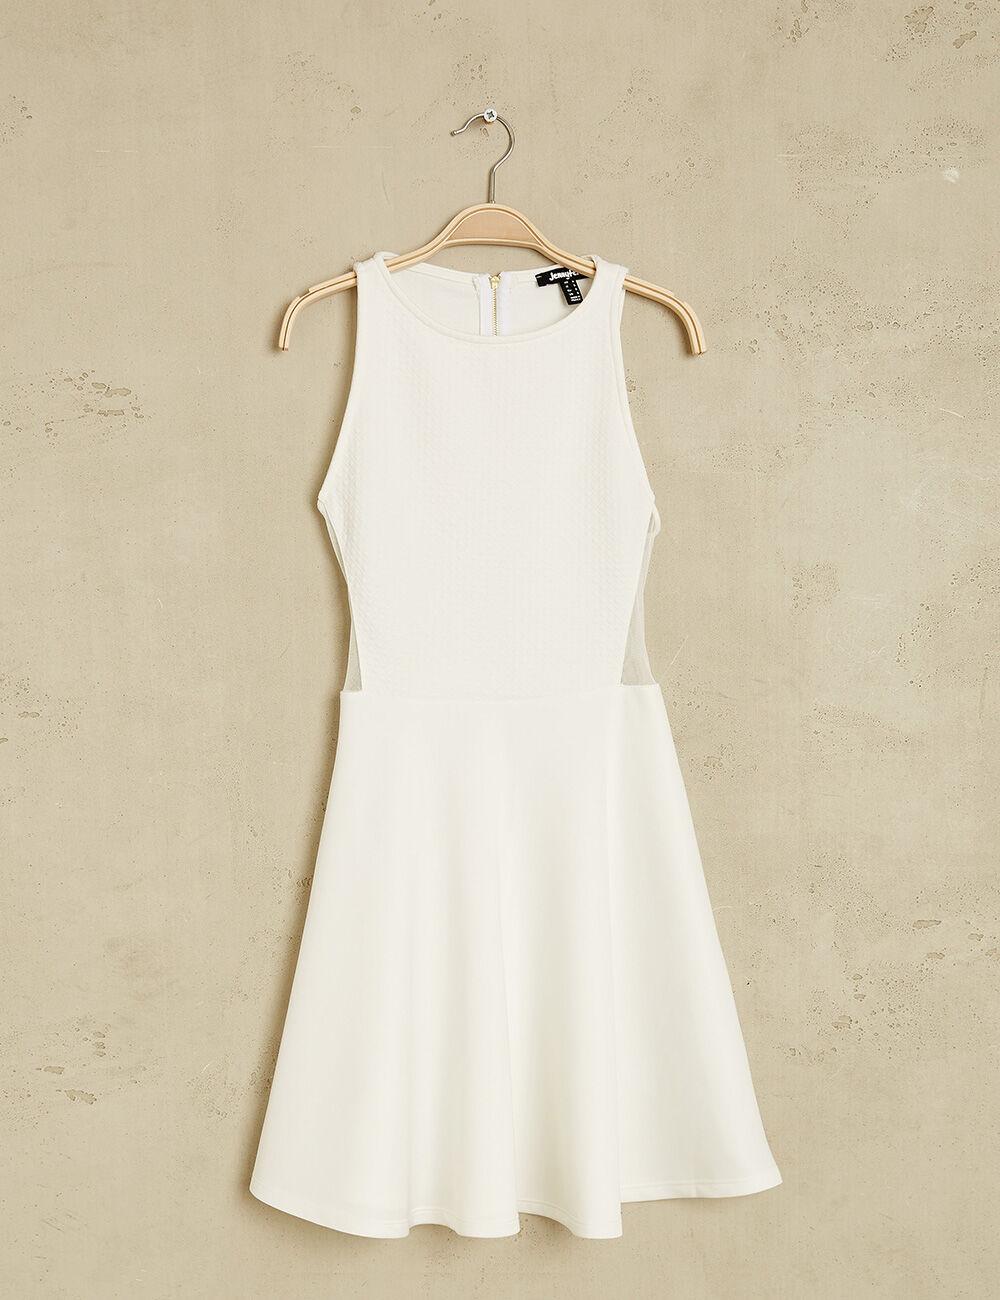 Robe blanche jennifer